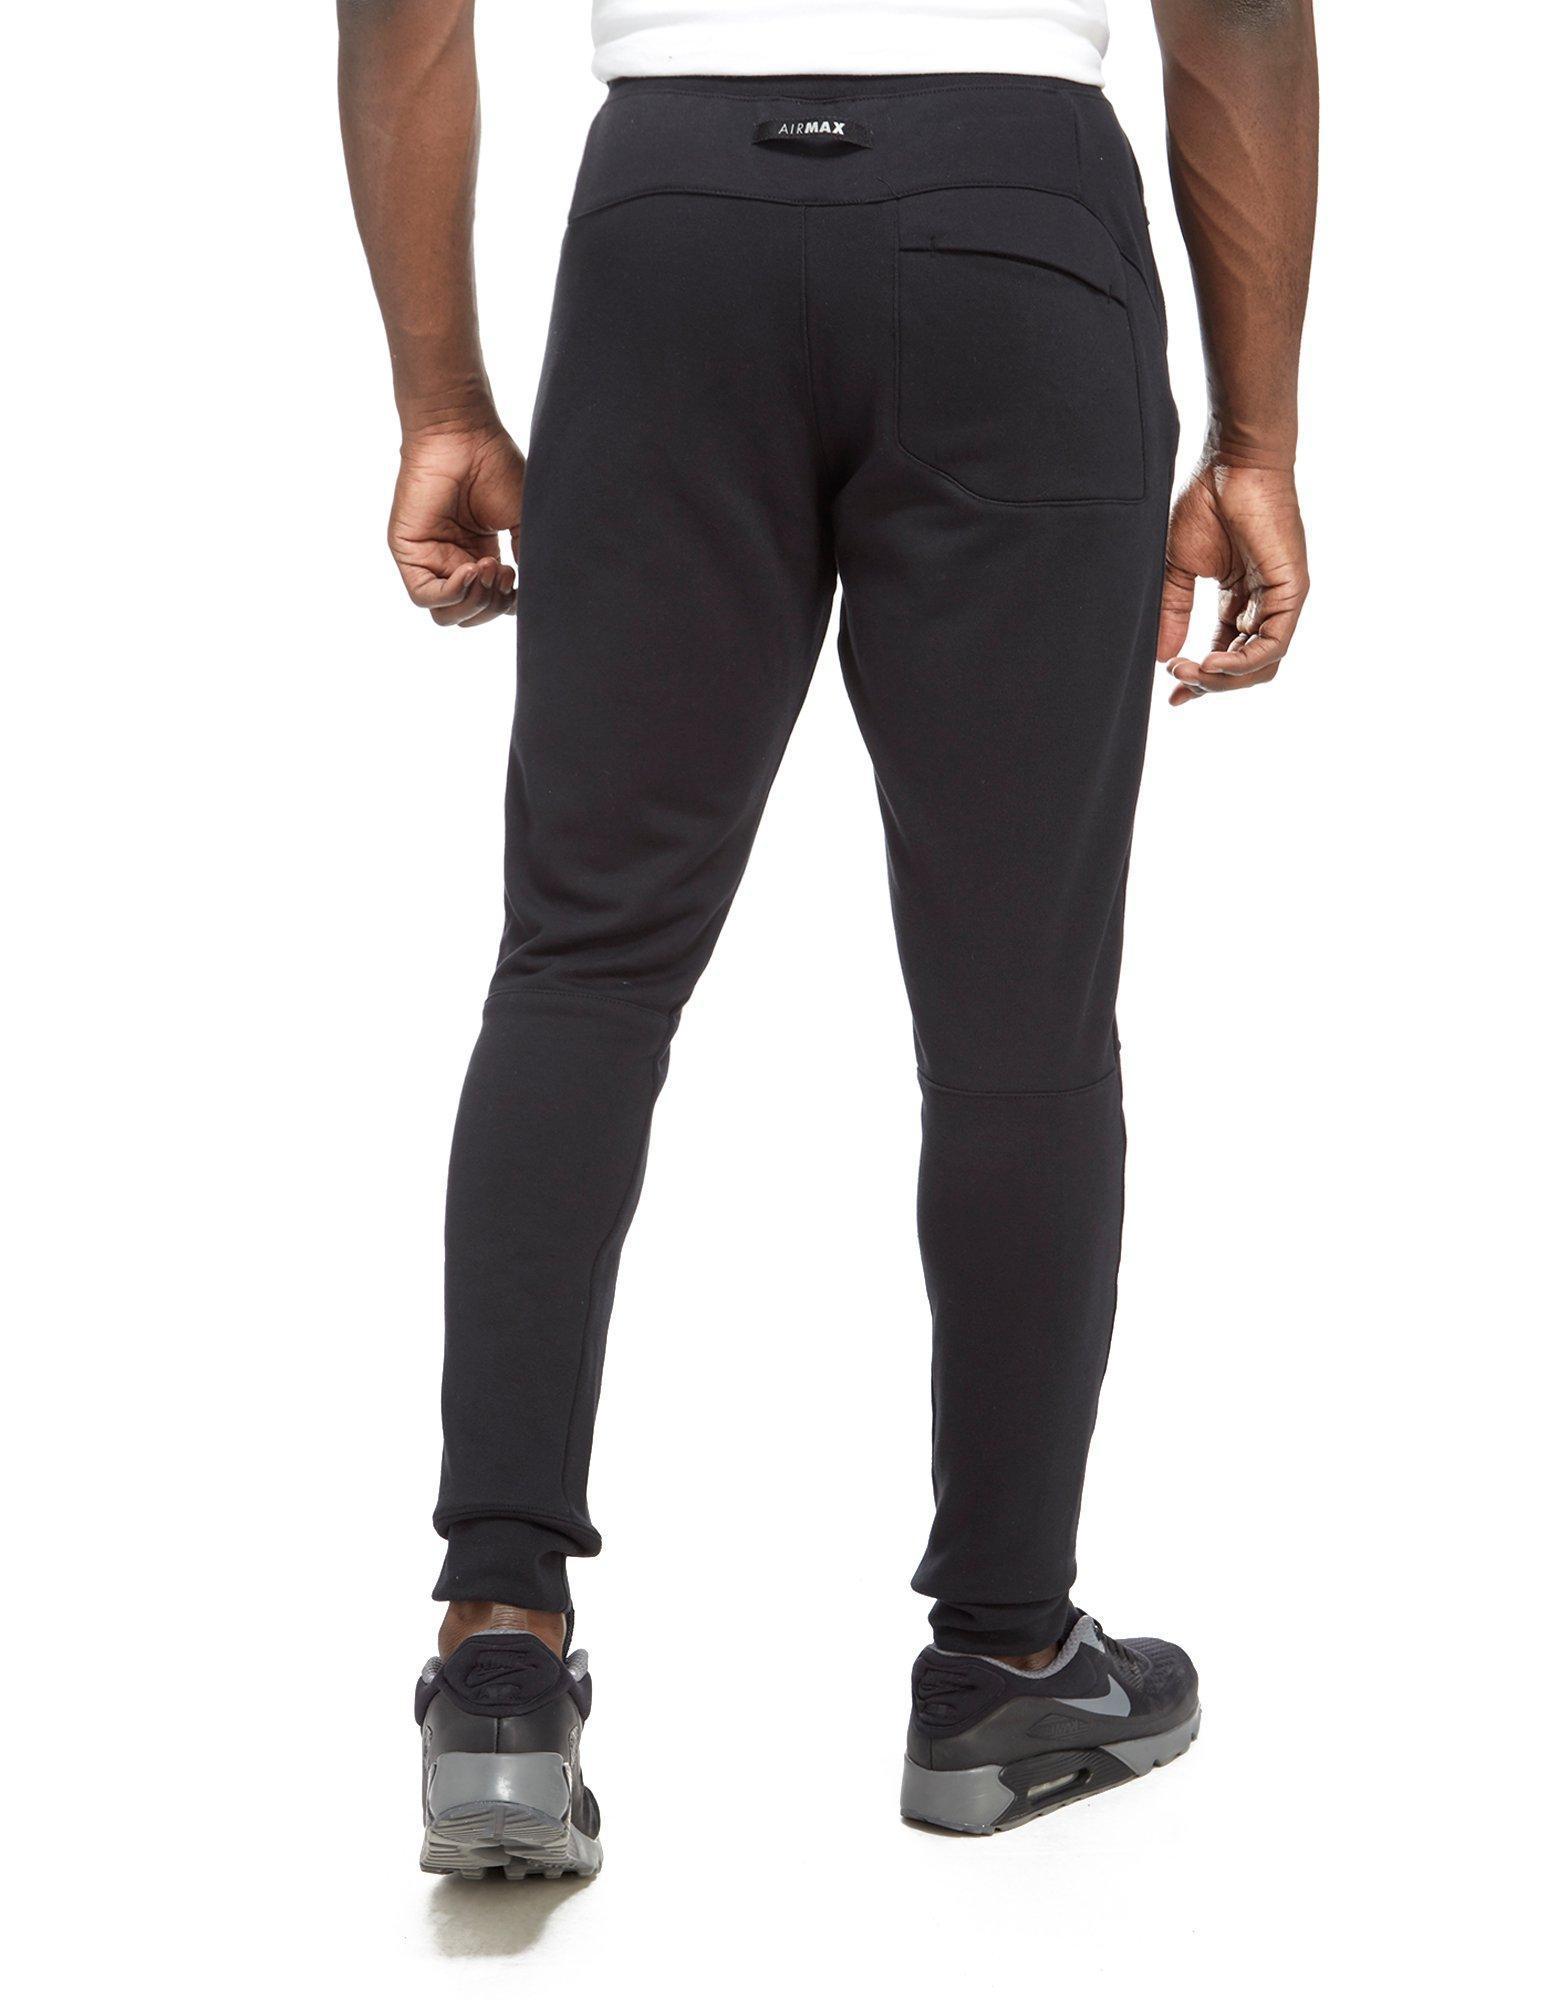 d208e8fbc8 Nike Air Max Ft Pants in Black for Men - Lyst